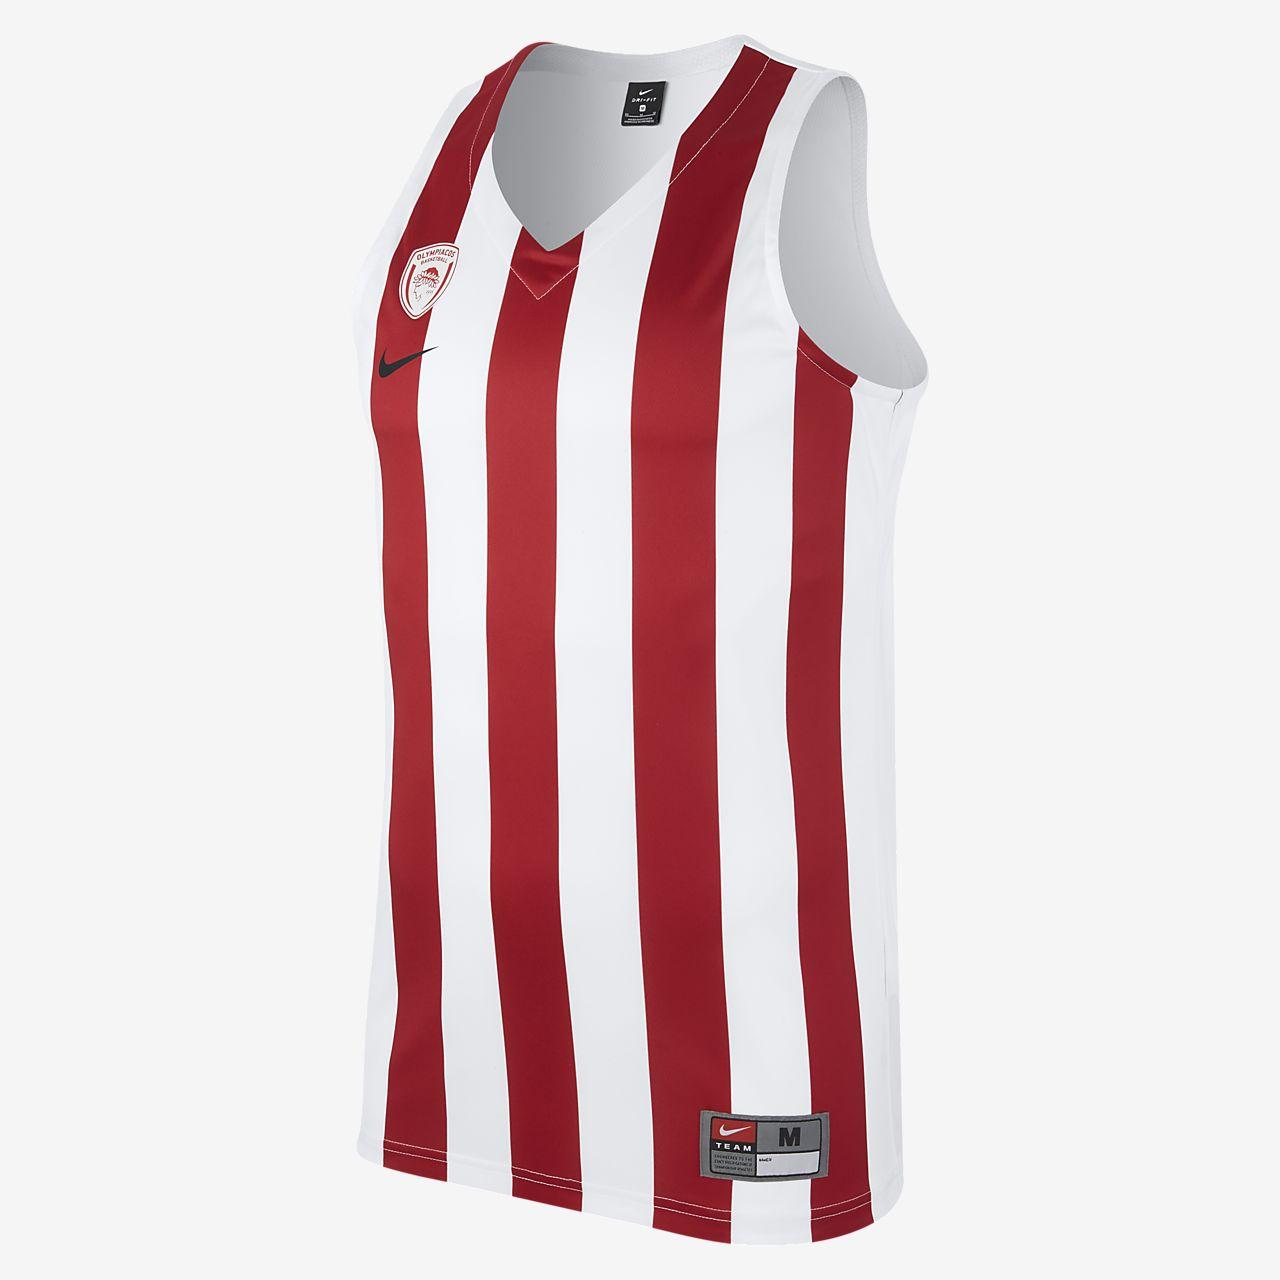 timeless design aa09c 8ce6b ... Olympiacos BC Replica Herren-Basketballtrikot